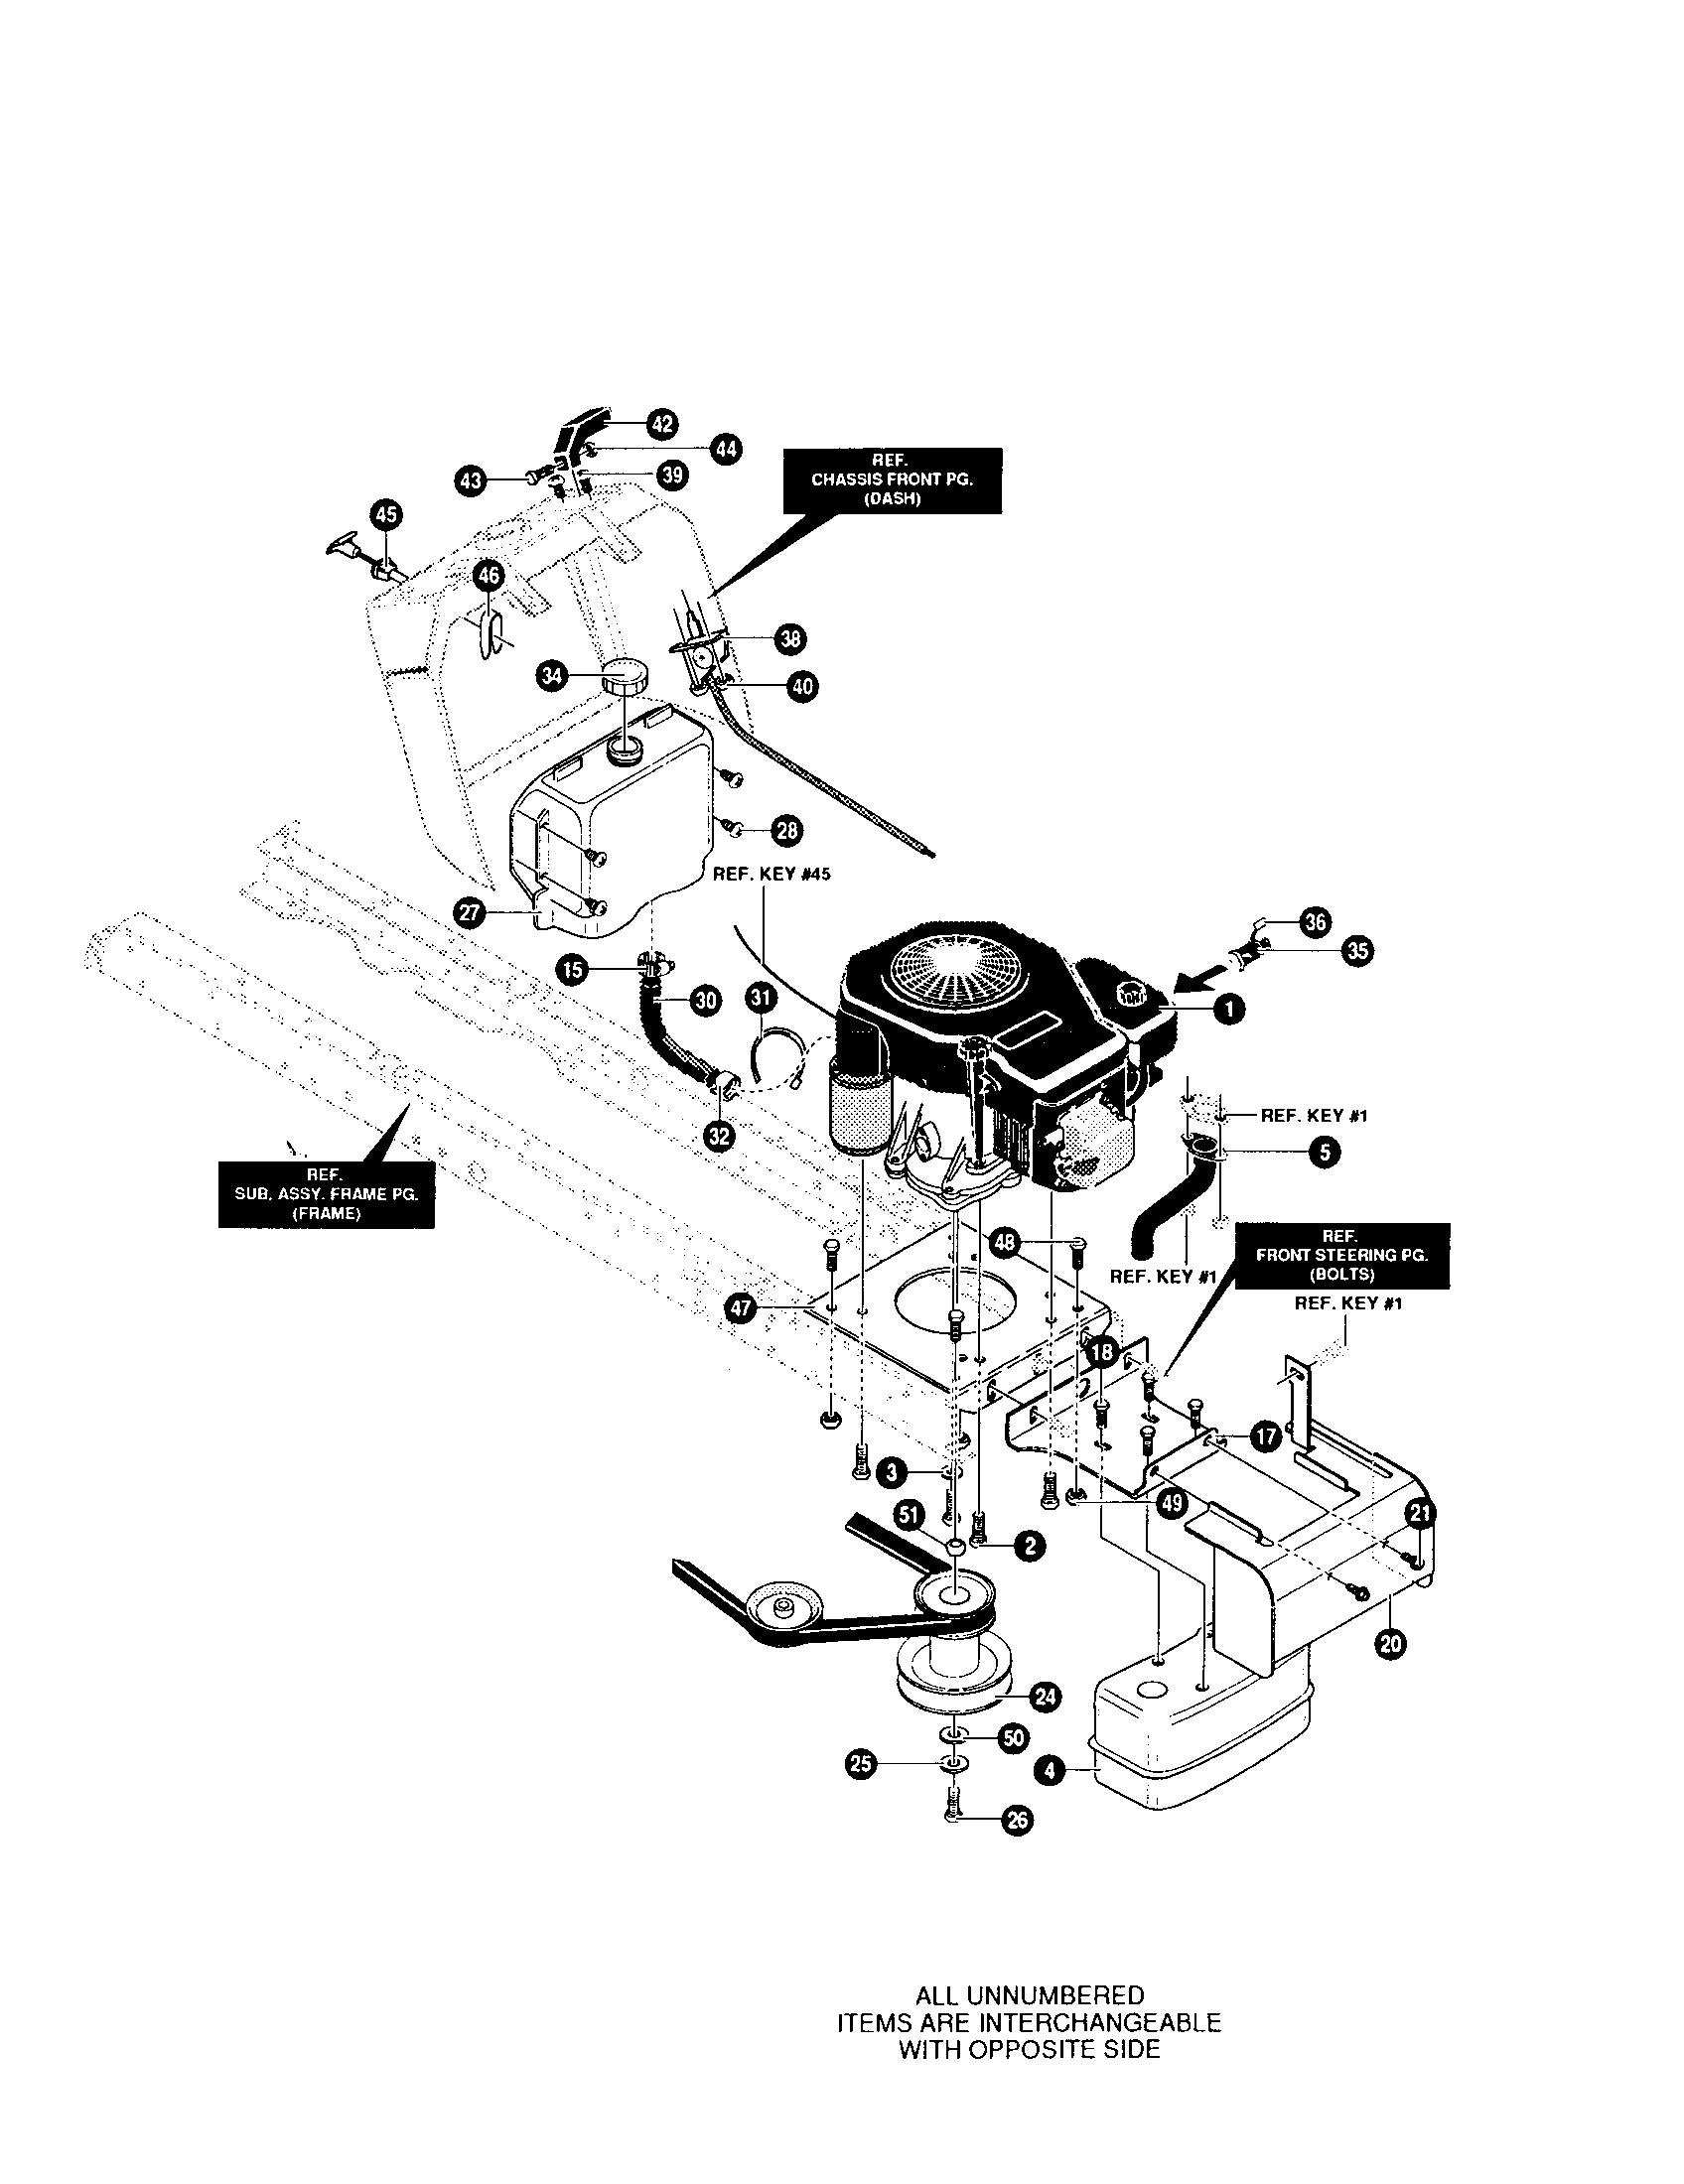 kohler engines parts diagram troubleshooting